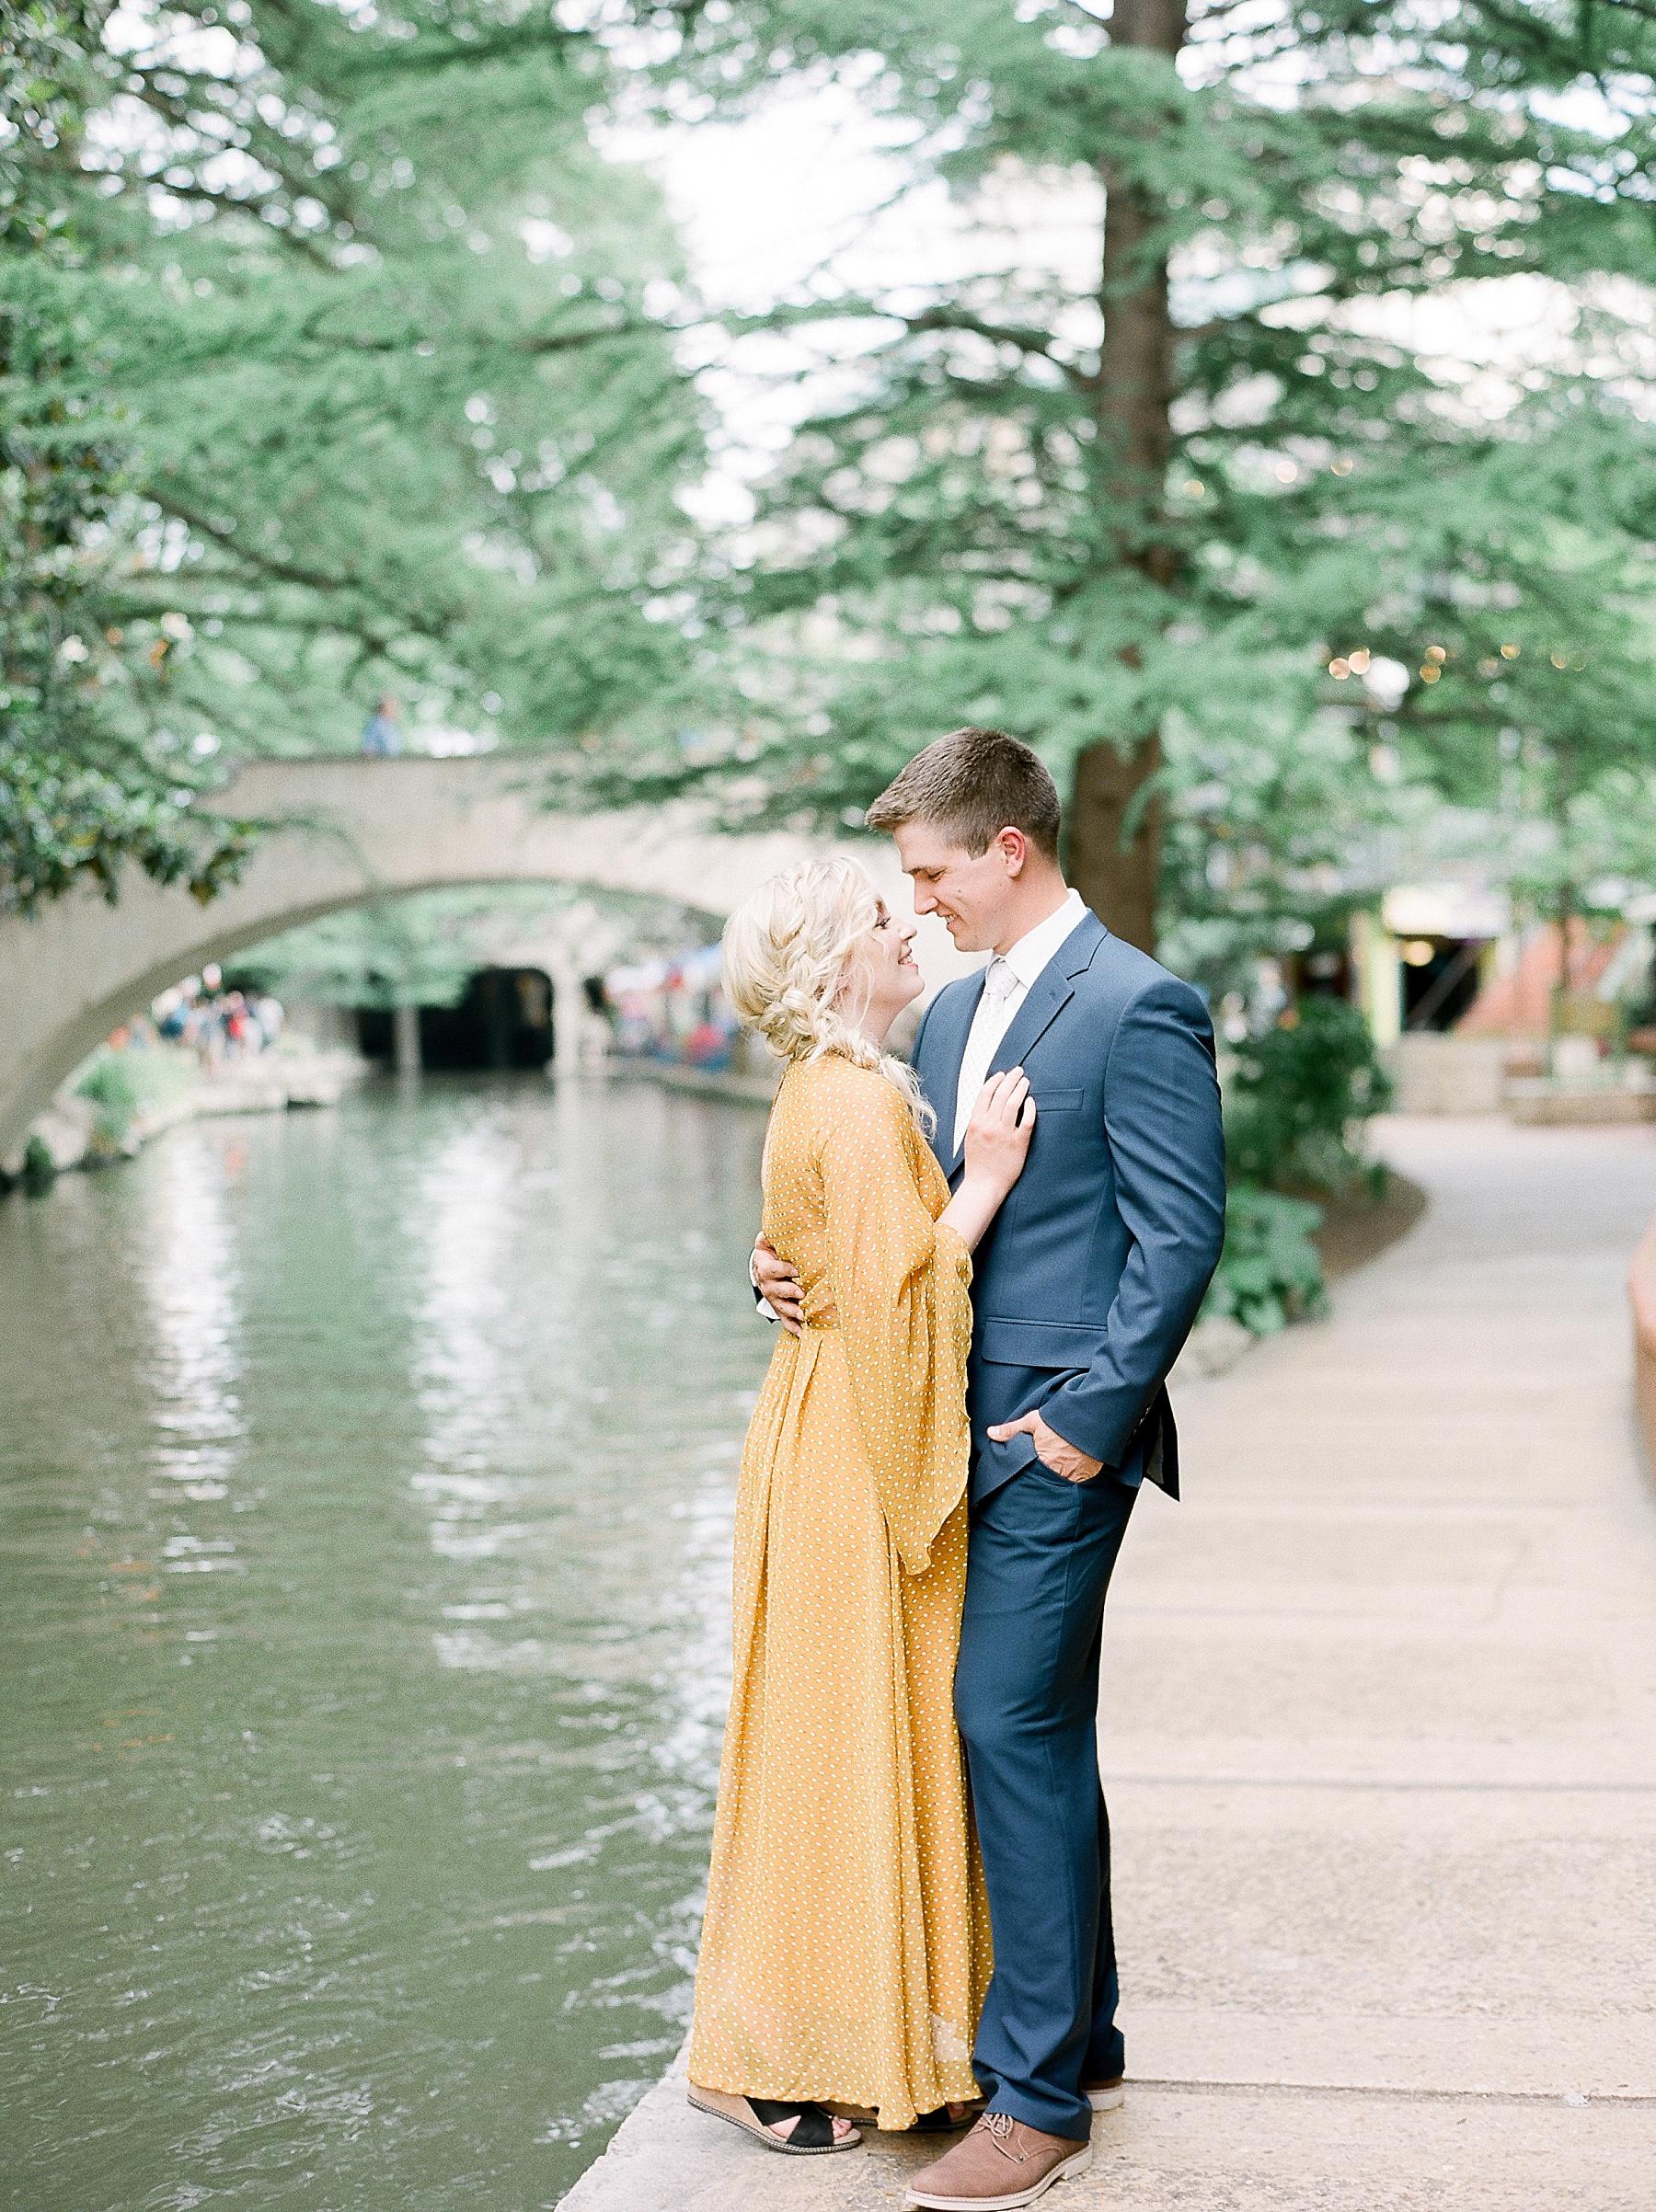 Hybrid Co Anniversary Shoot at River Walk, San Antonio, TX by Julie Paisley Photography_0002.jpg